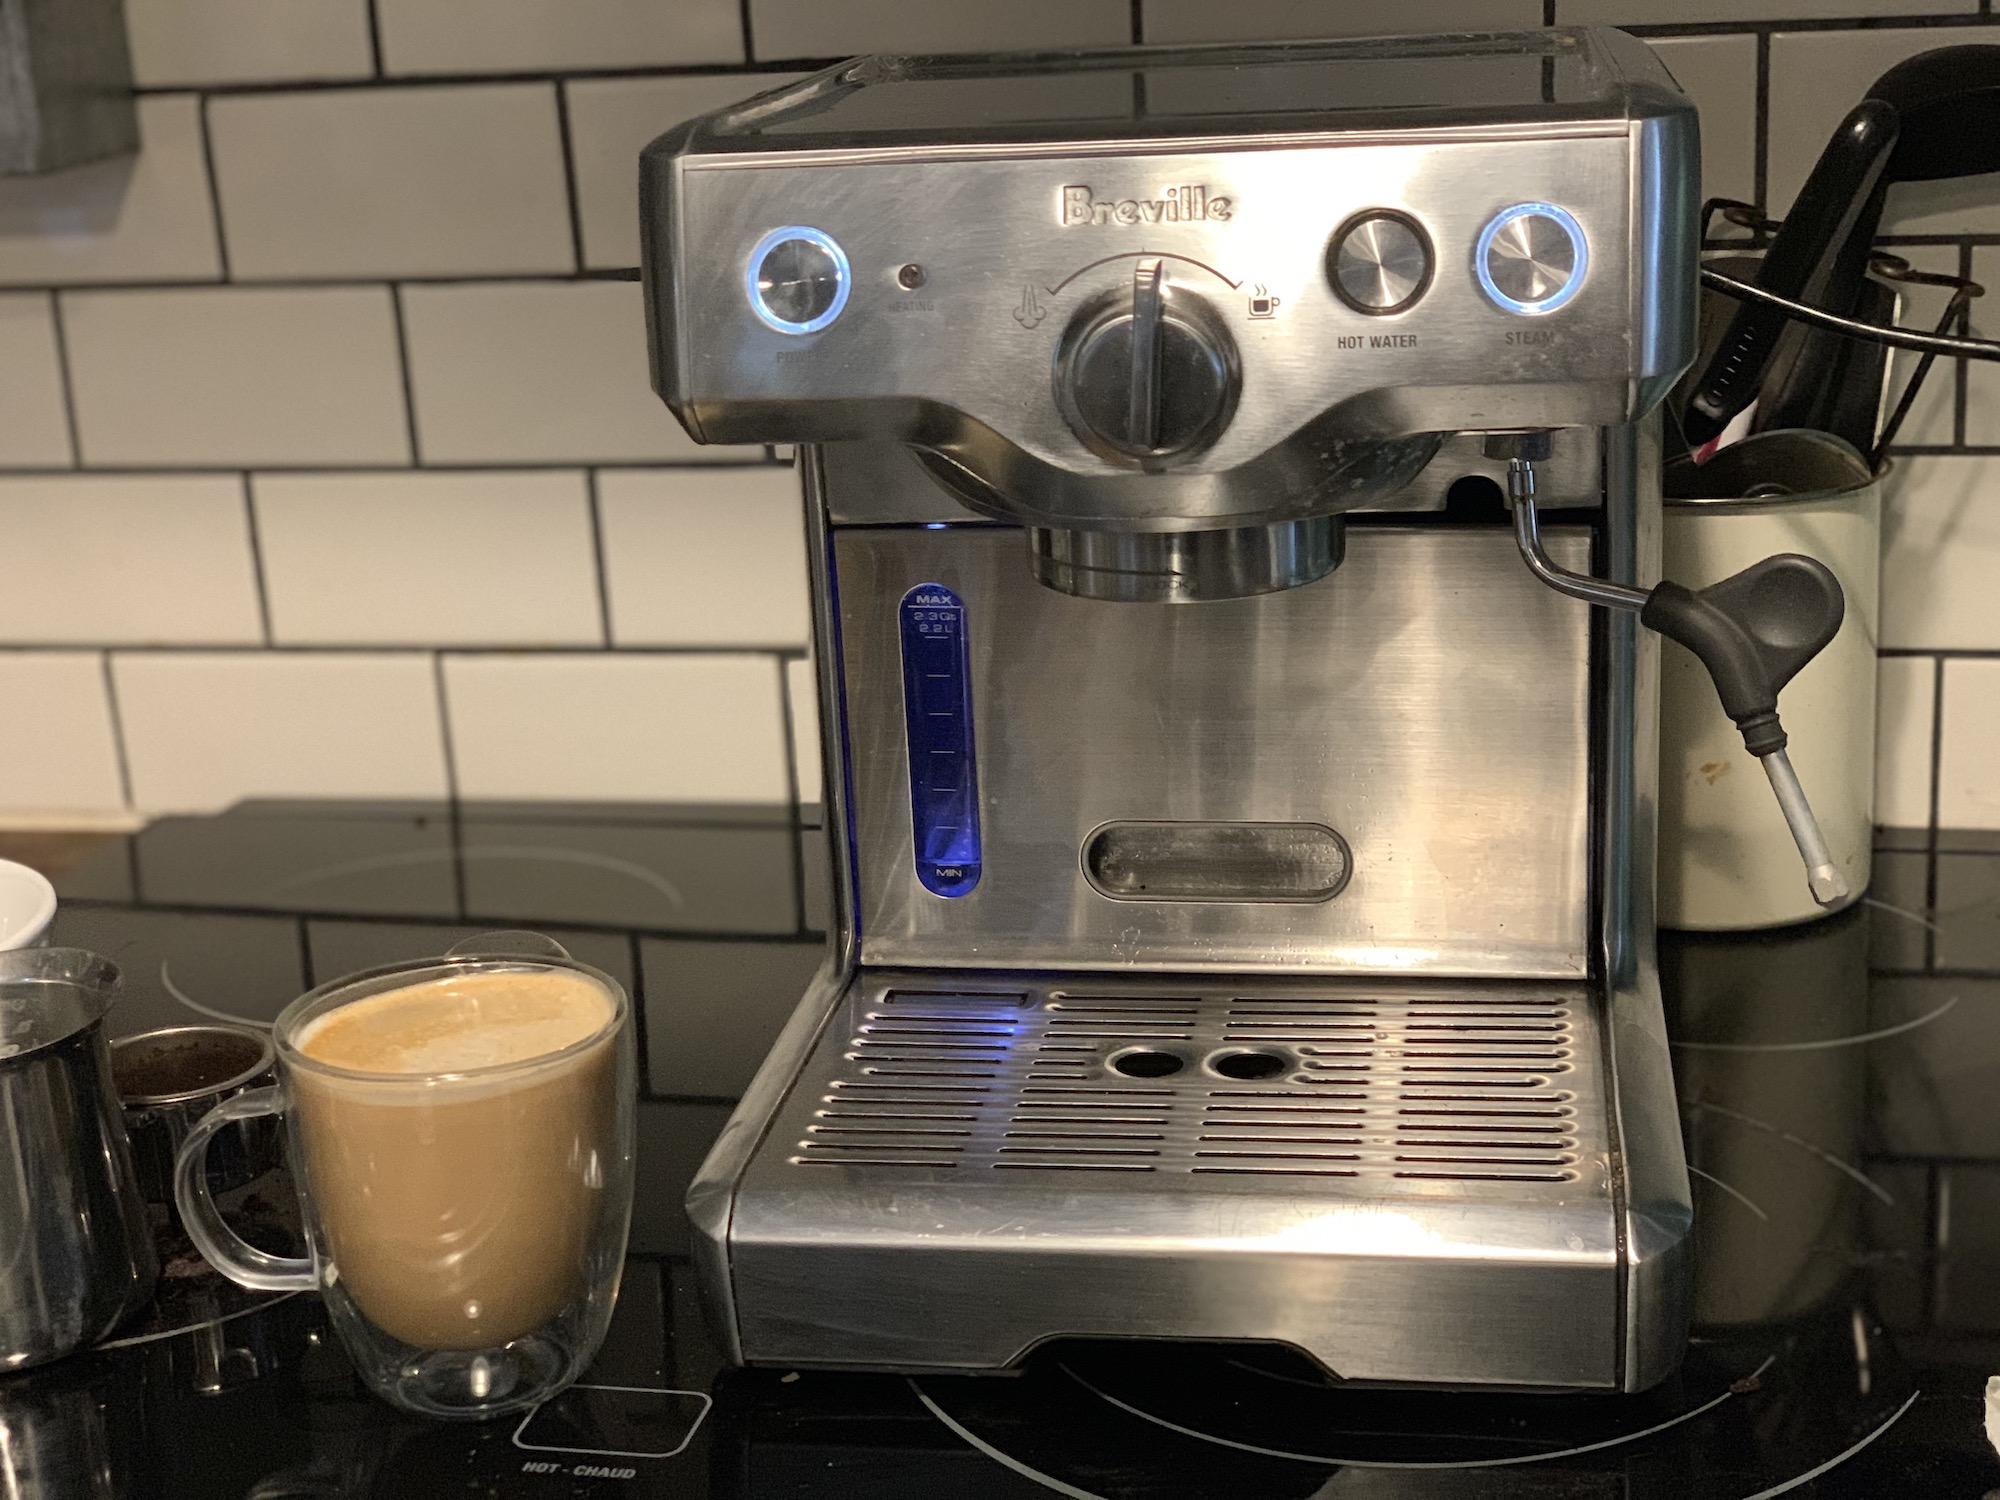 Breville duo temp lattes